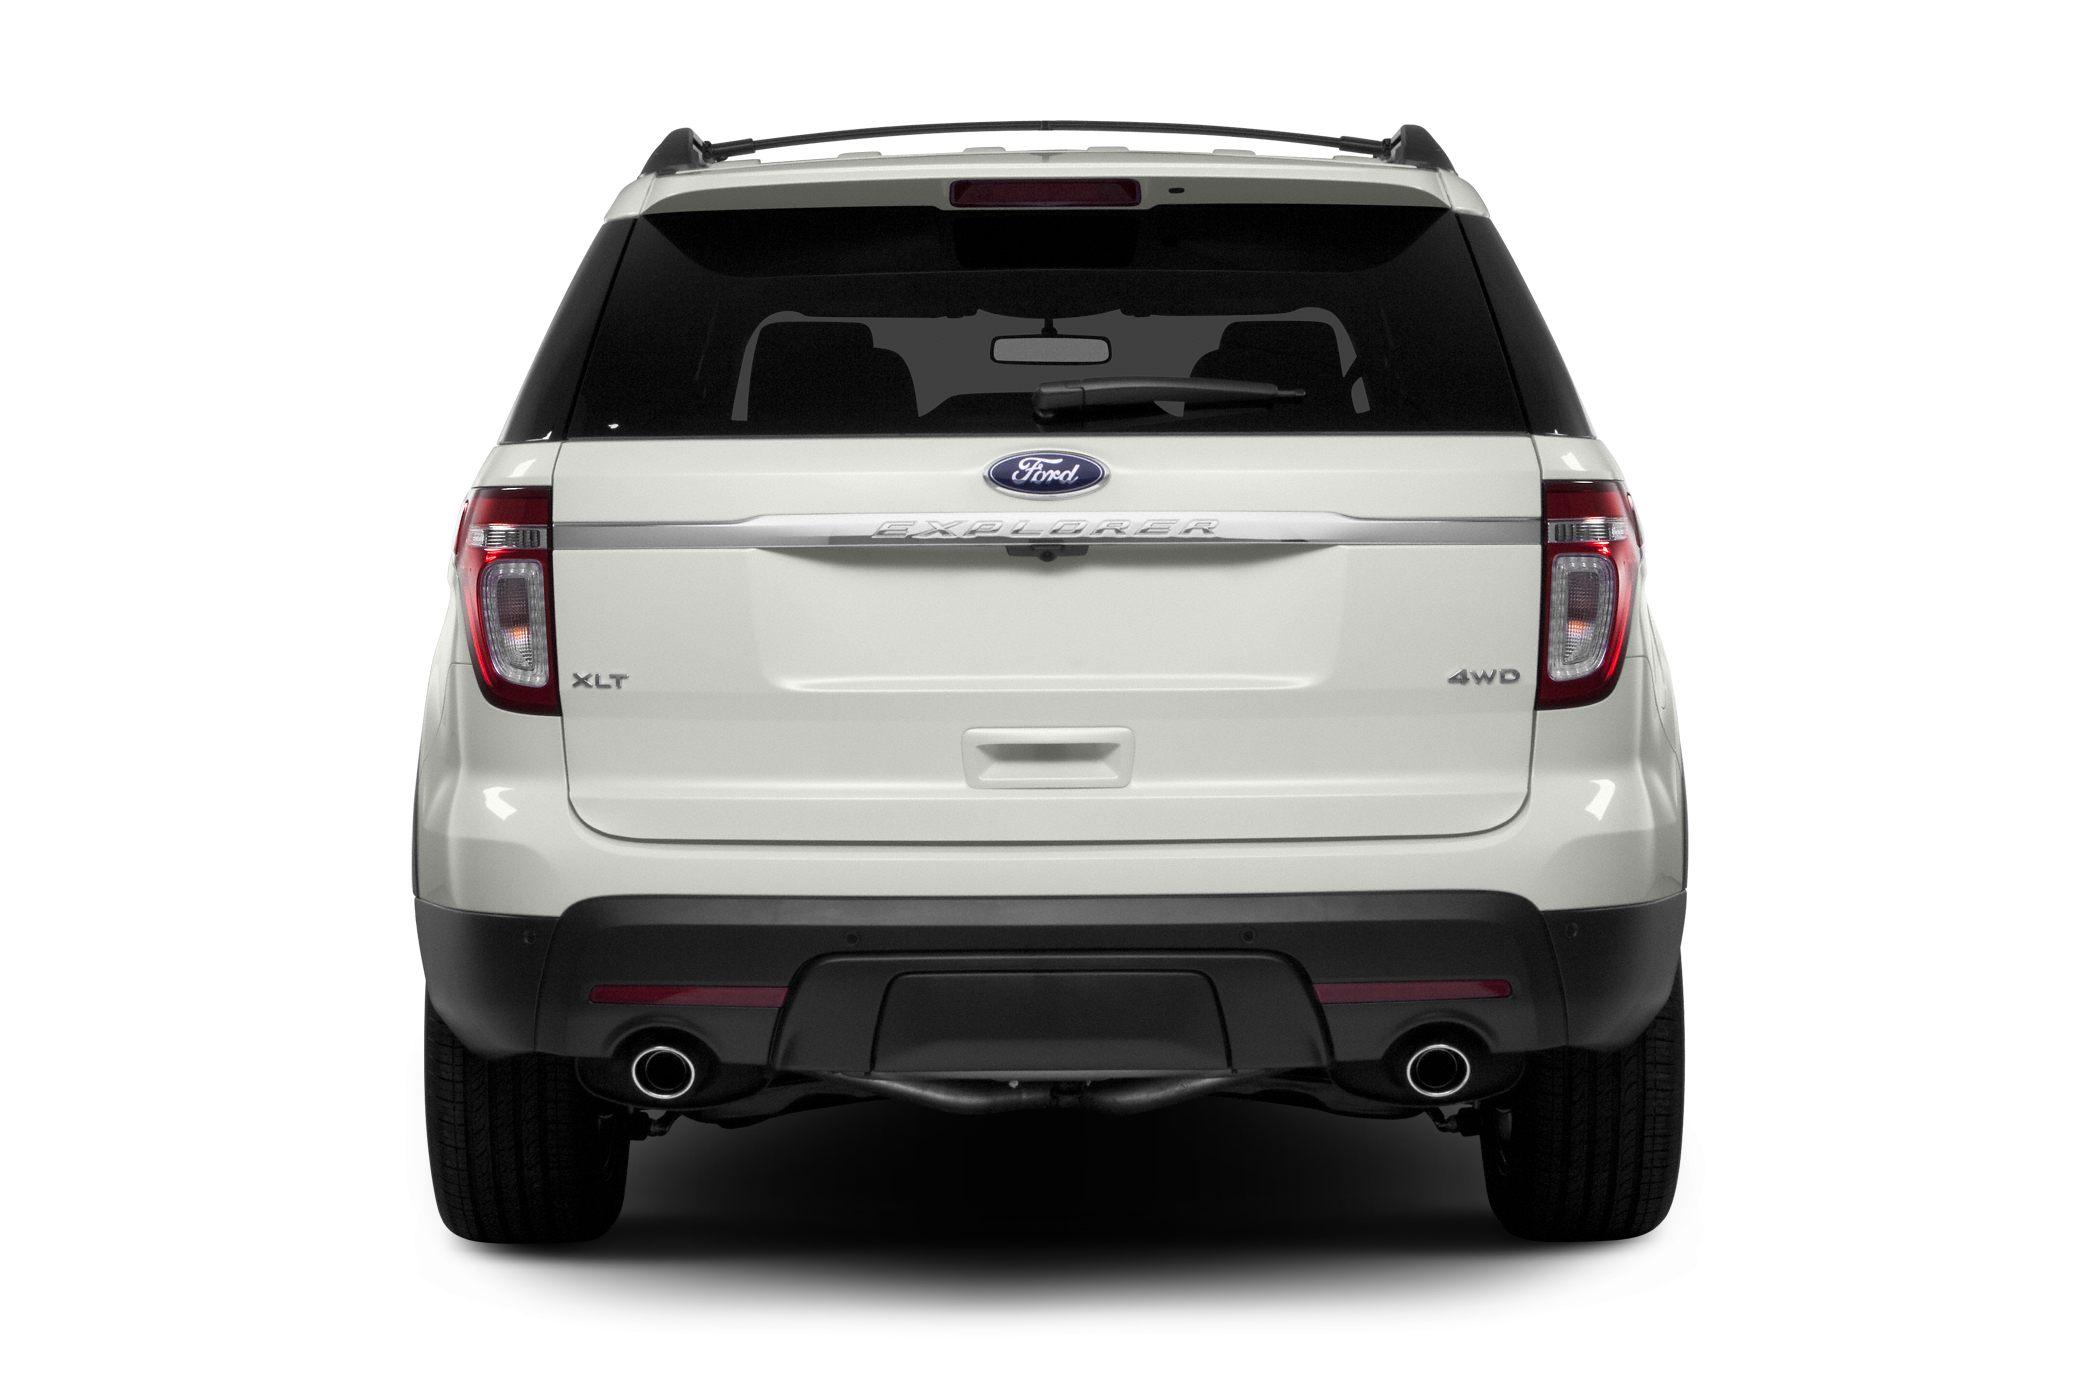 Mitsubishi All New Pajero Sport 2017 >> Comparison - Ford Explorer Limited 2015 - vs - Mitsubishi Pajero GLS 2017 | SUV Drive